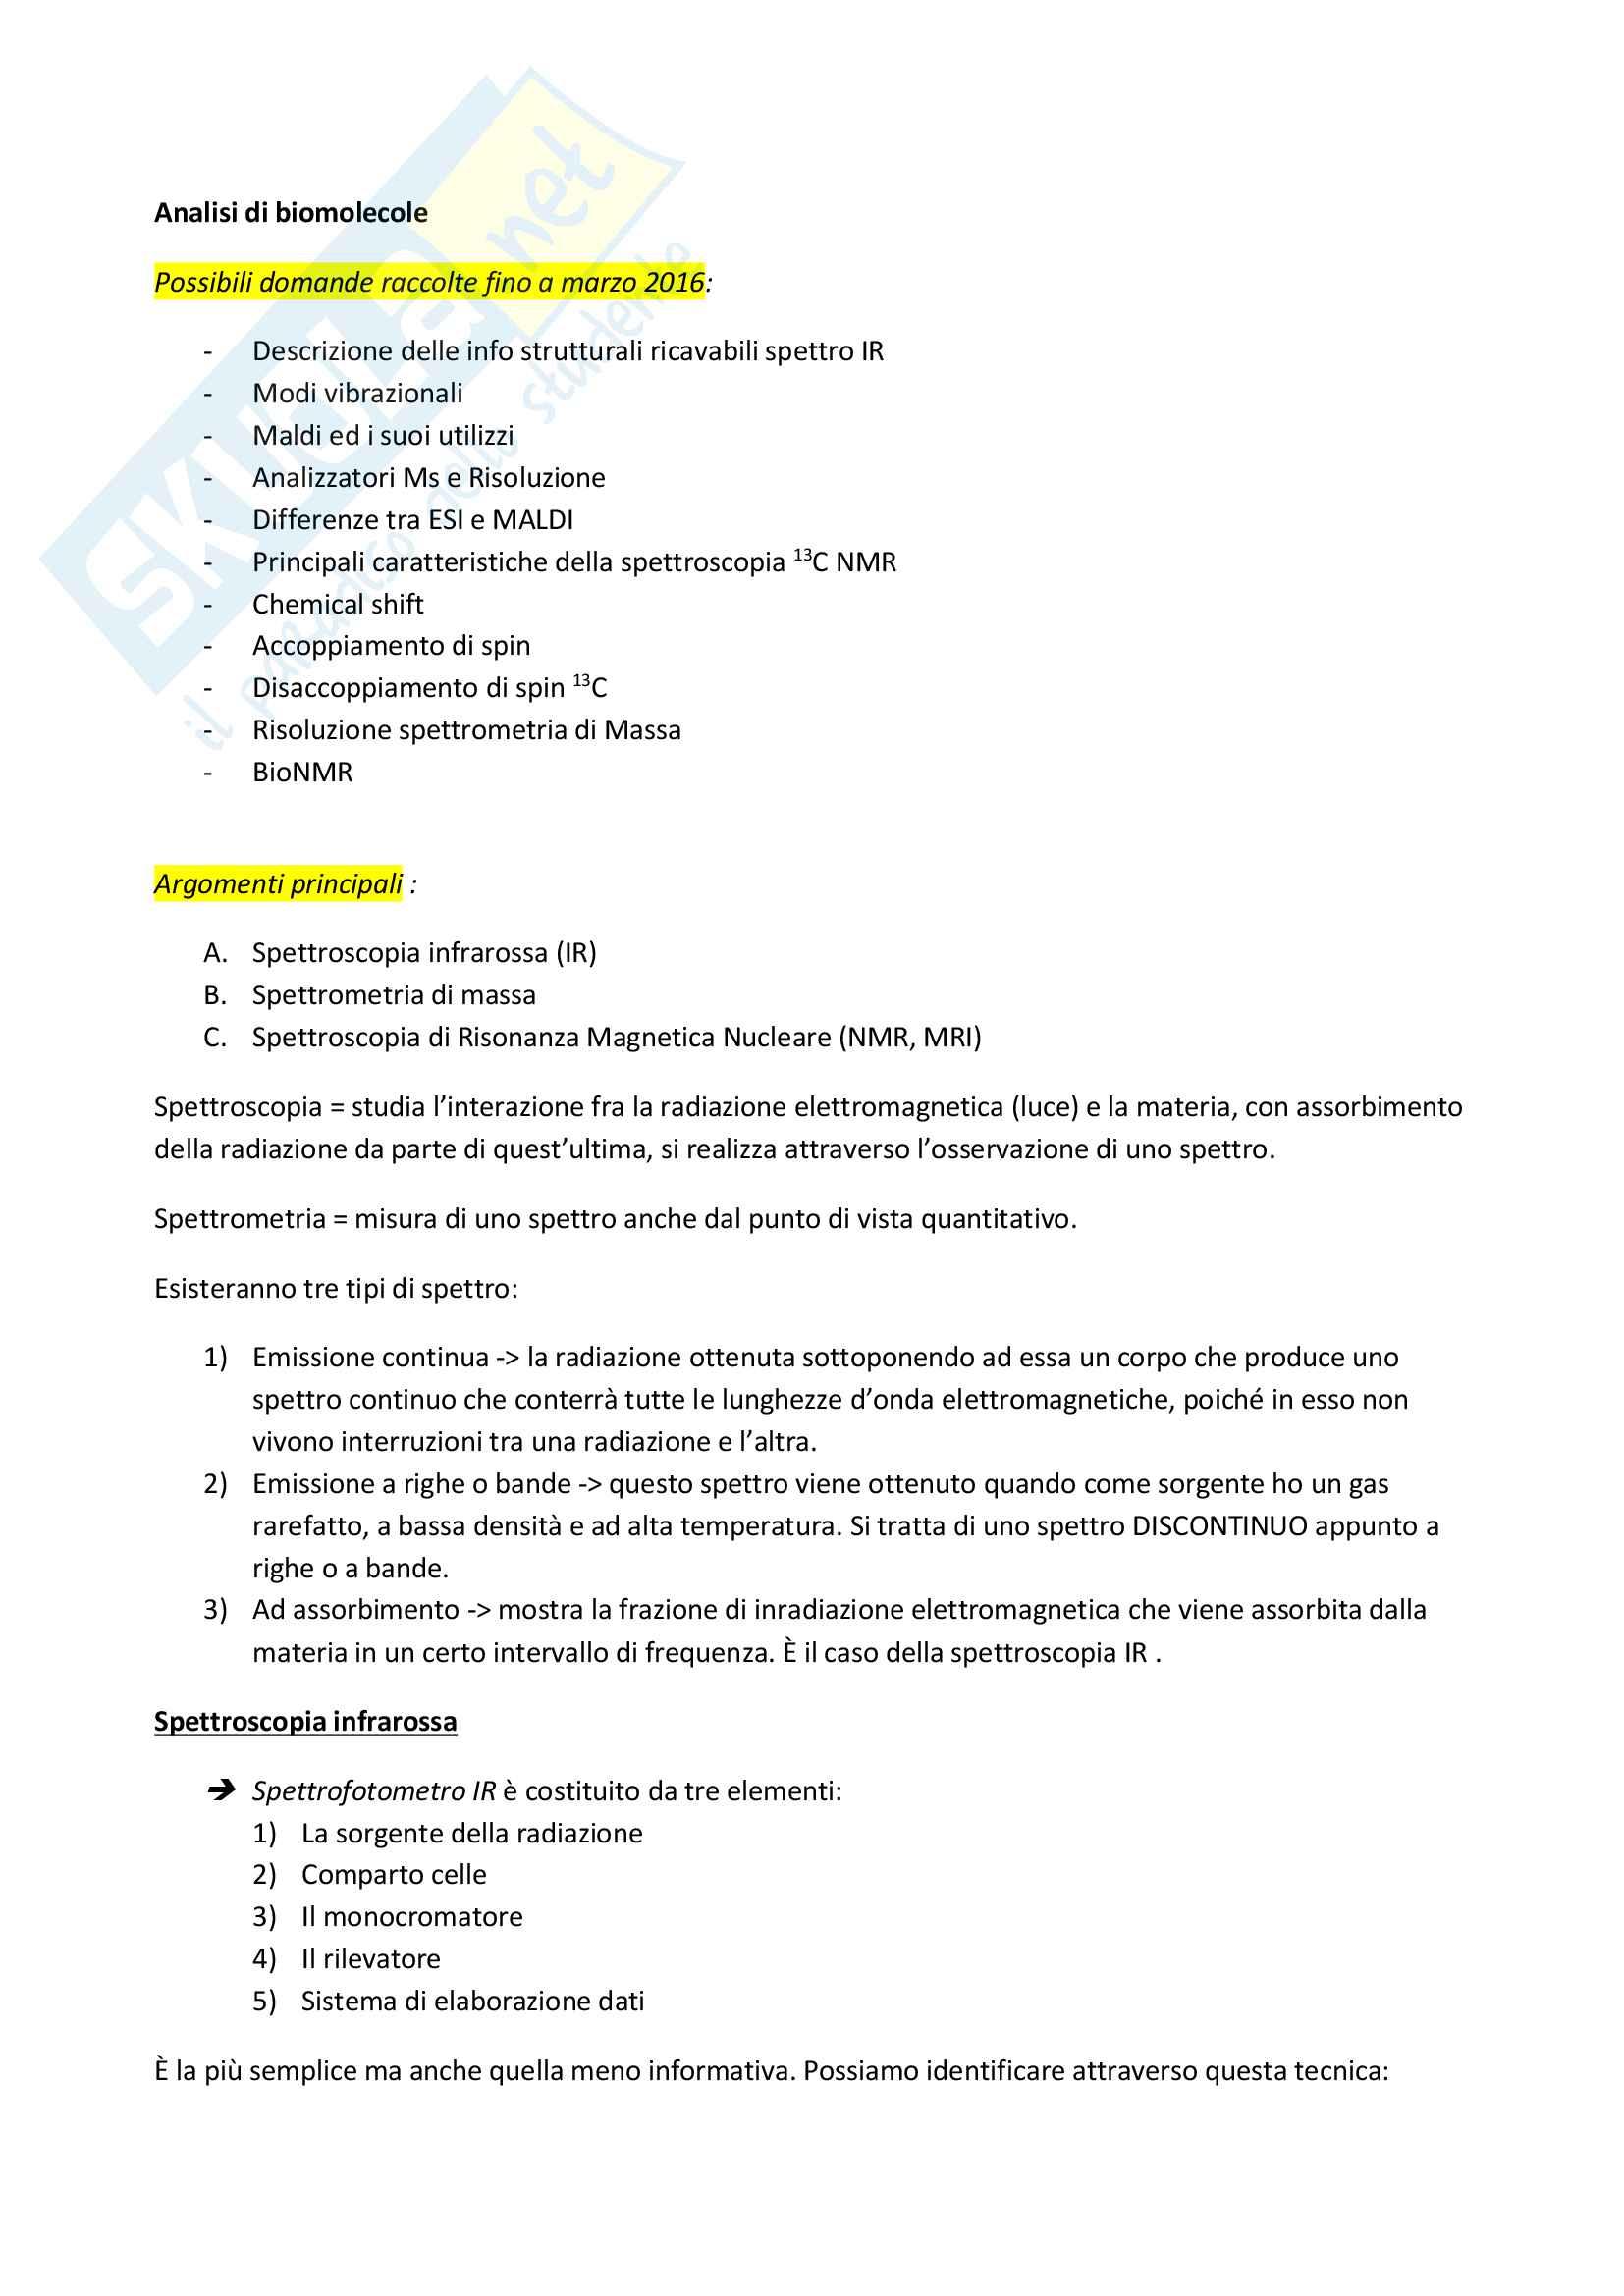 Analisi di biomolecole